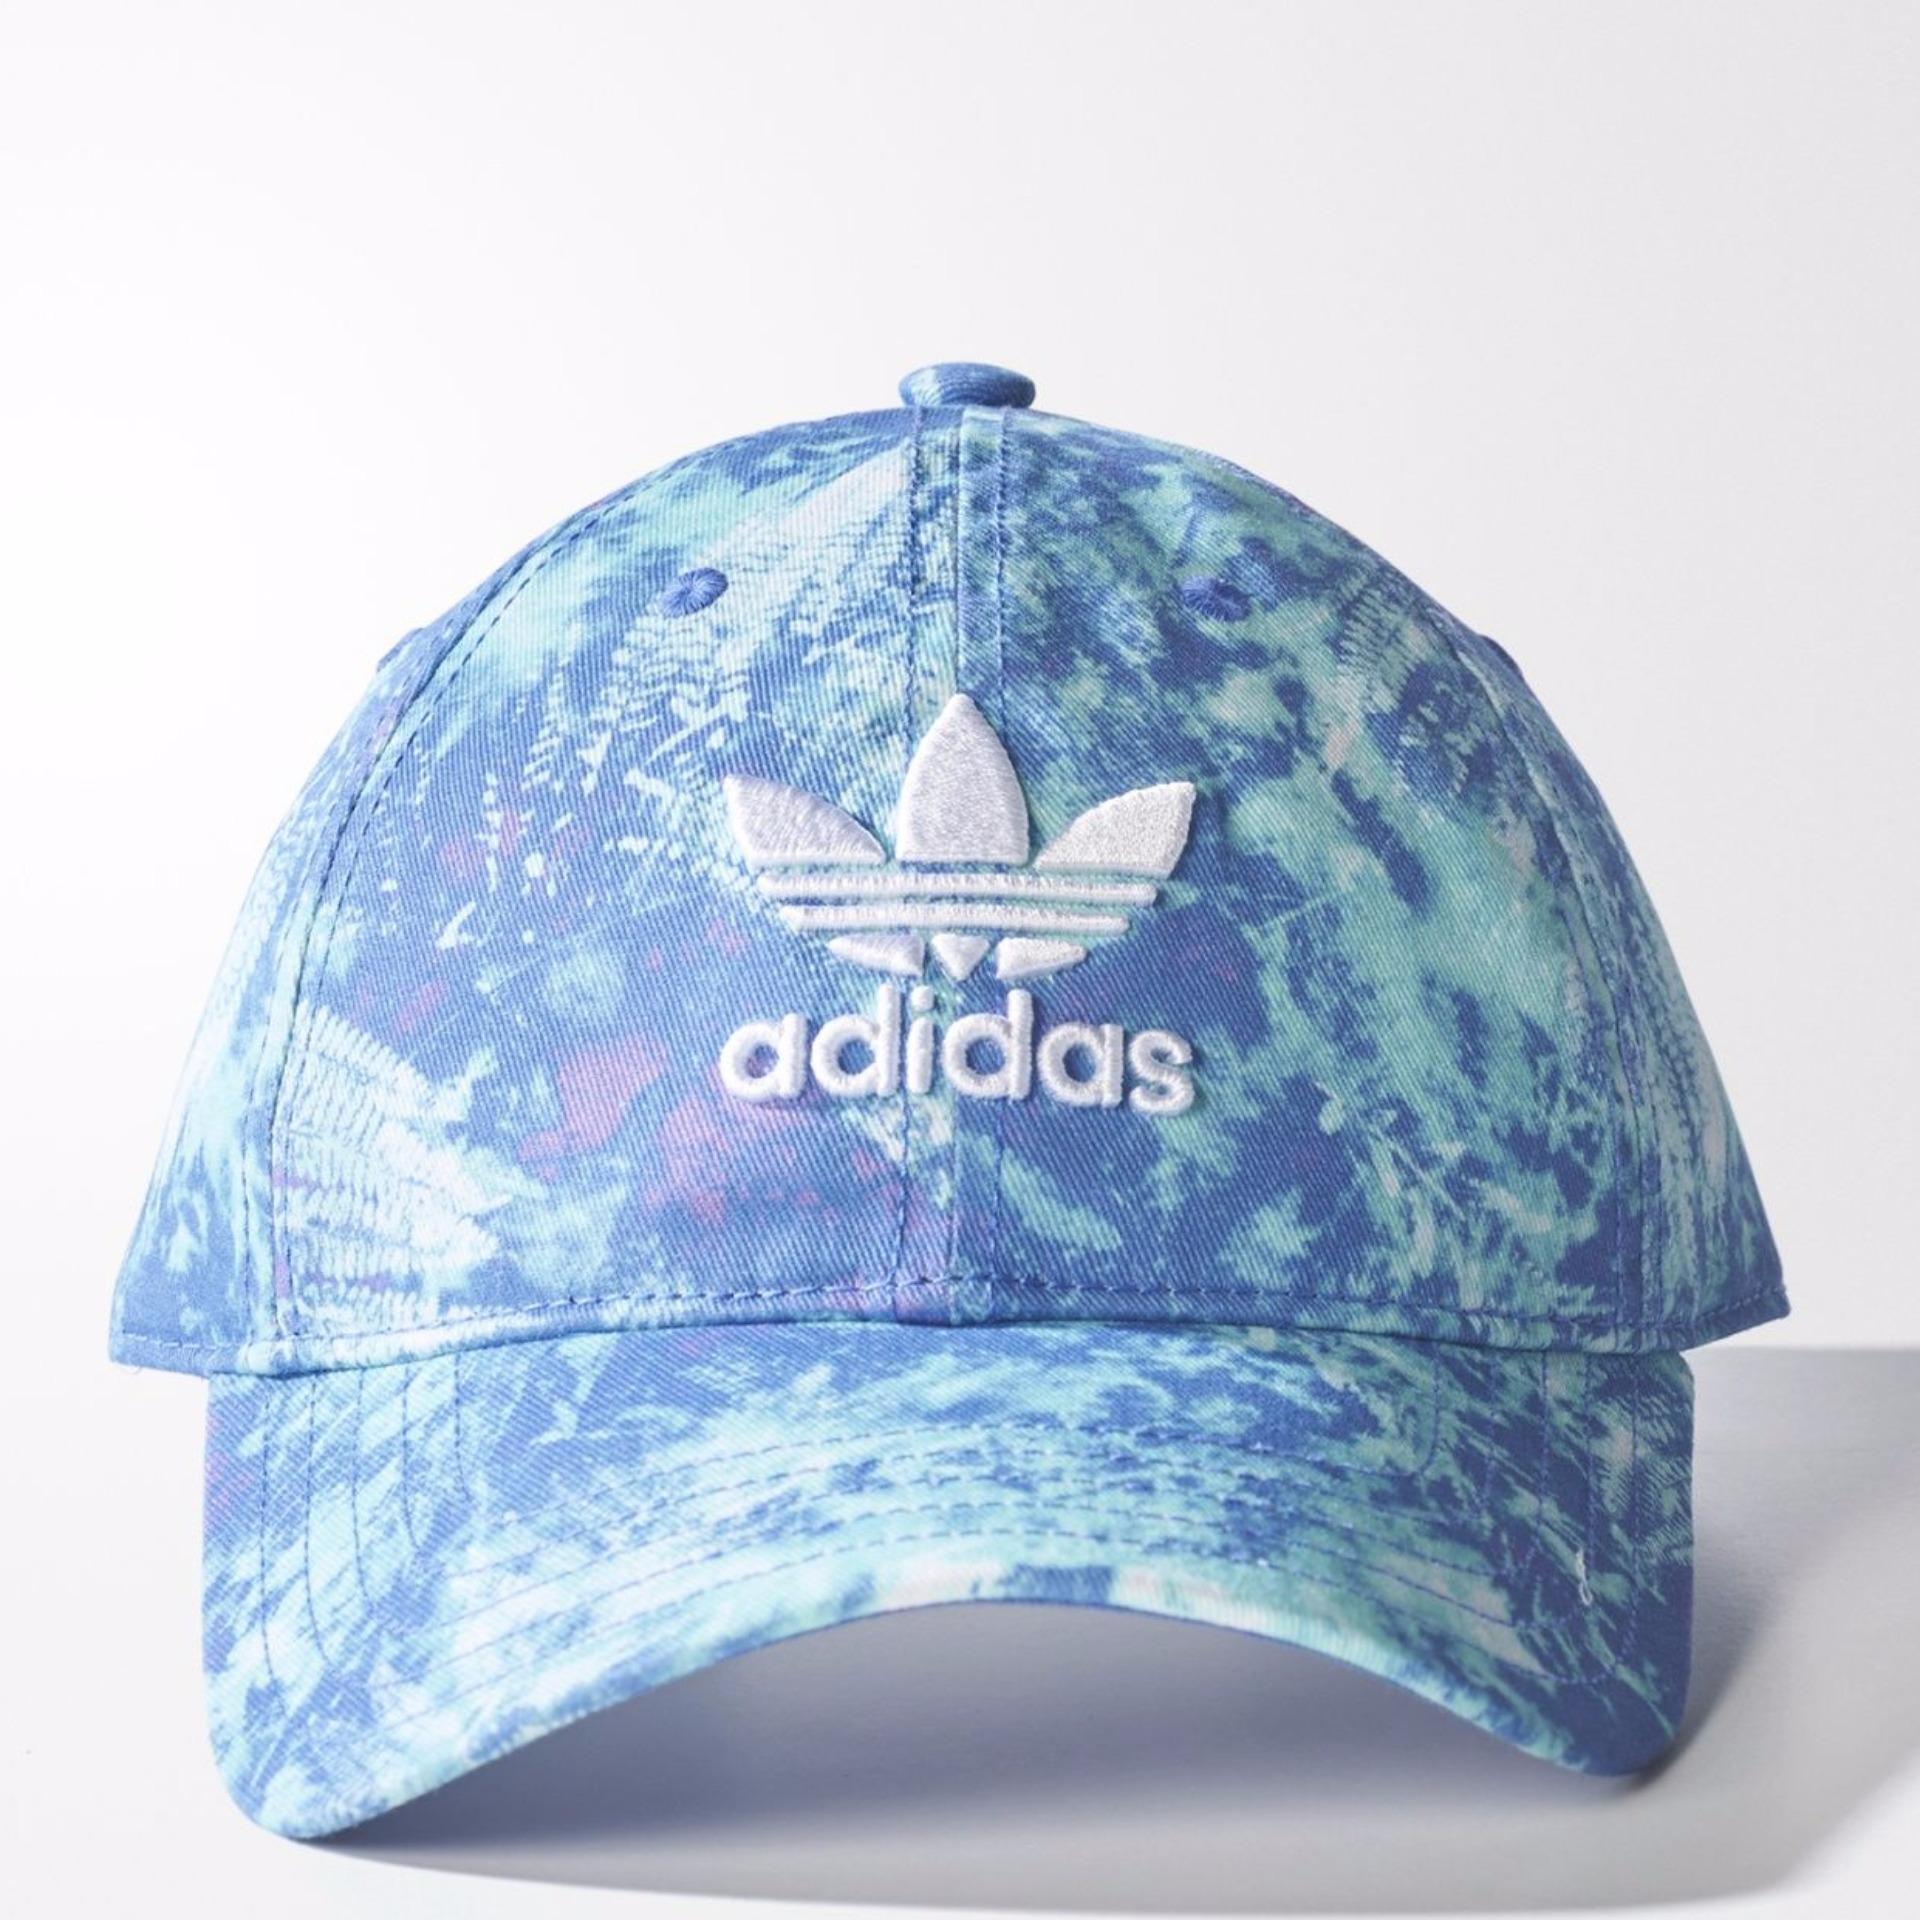 Harga Adidas Topi Wanita Ocean Elements Cf5489 Asli Adidas